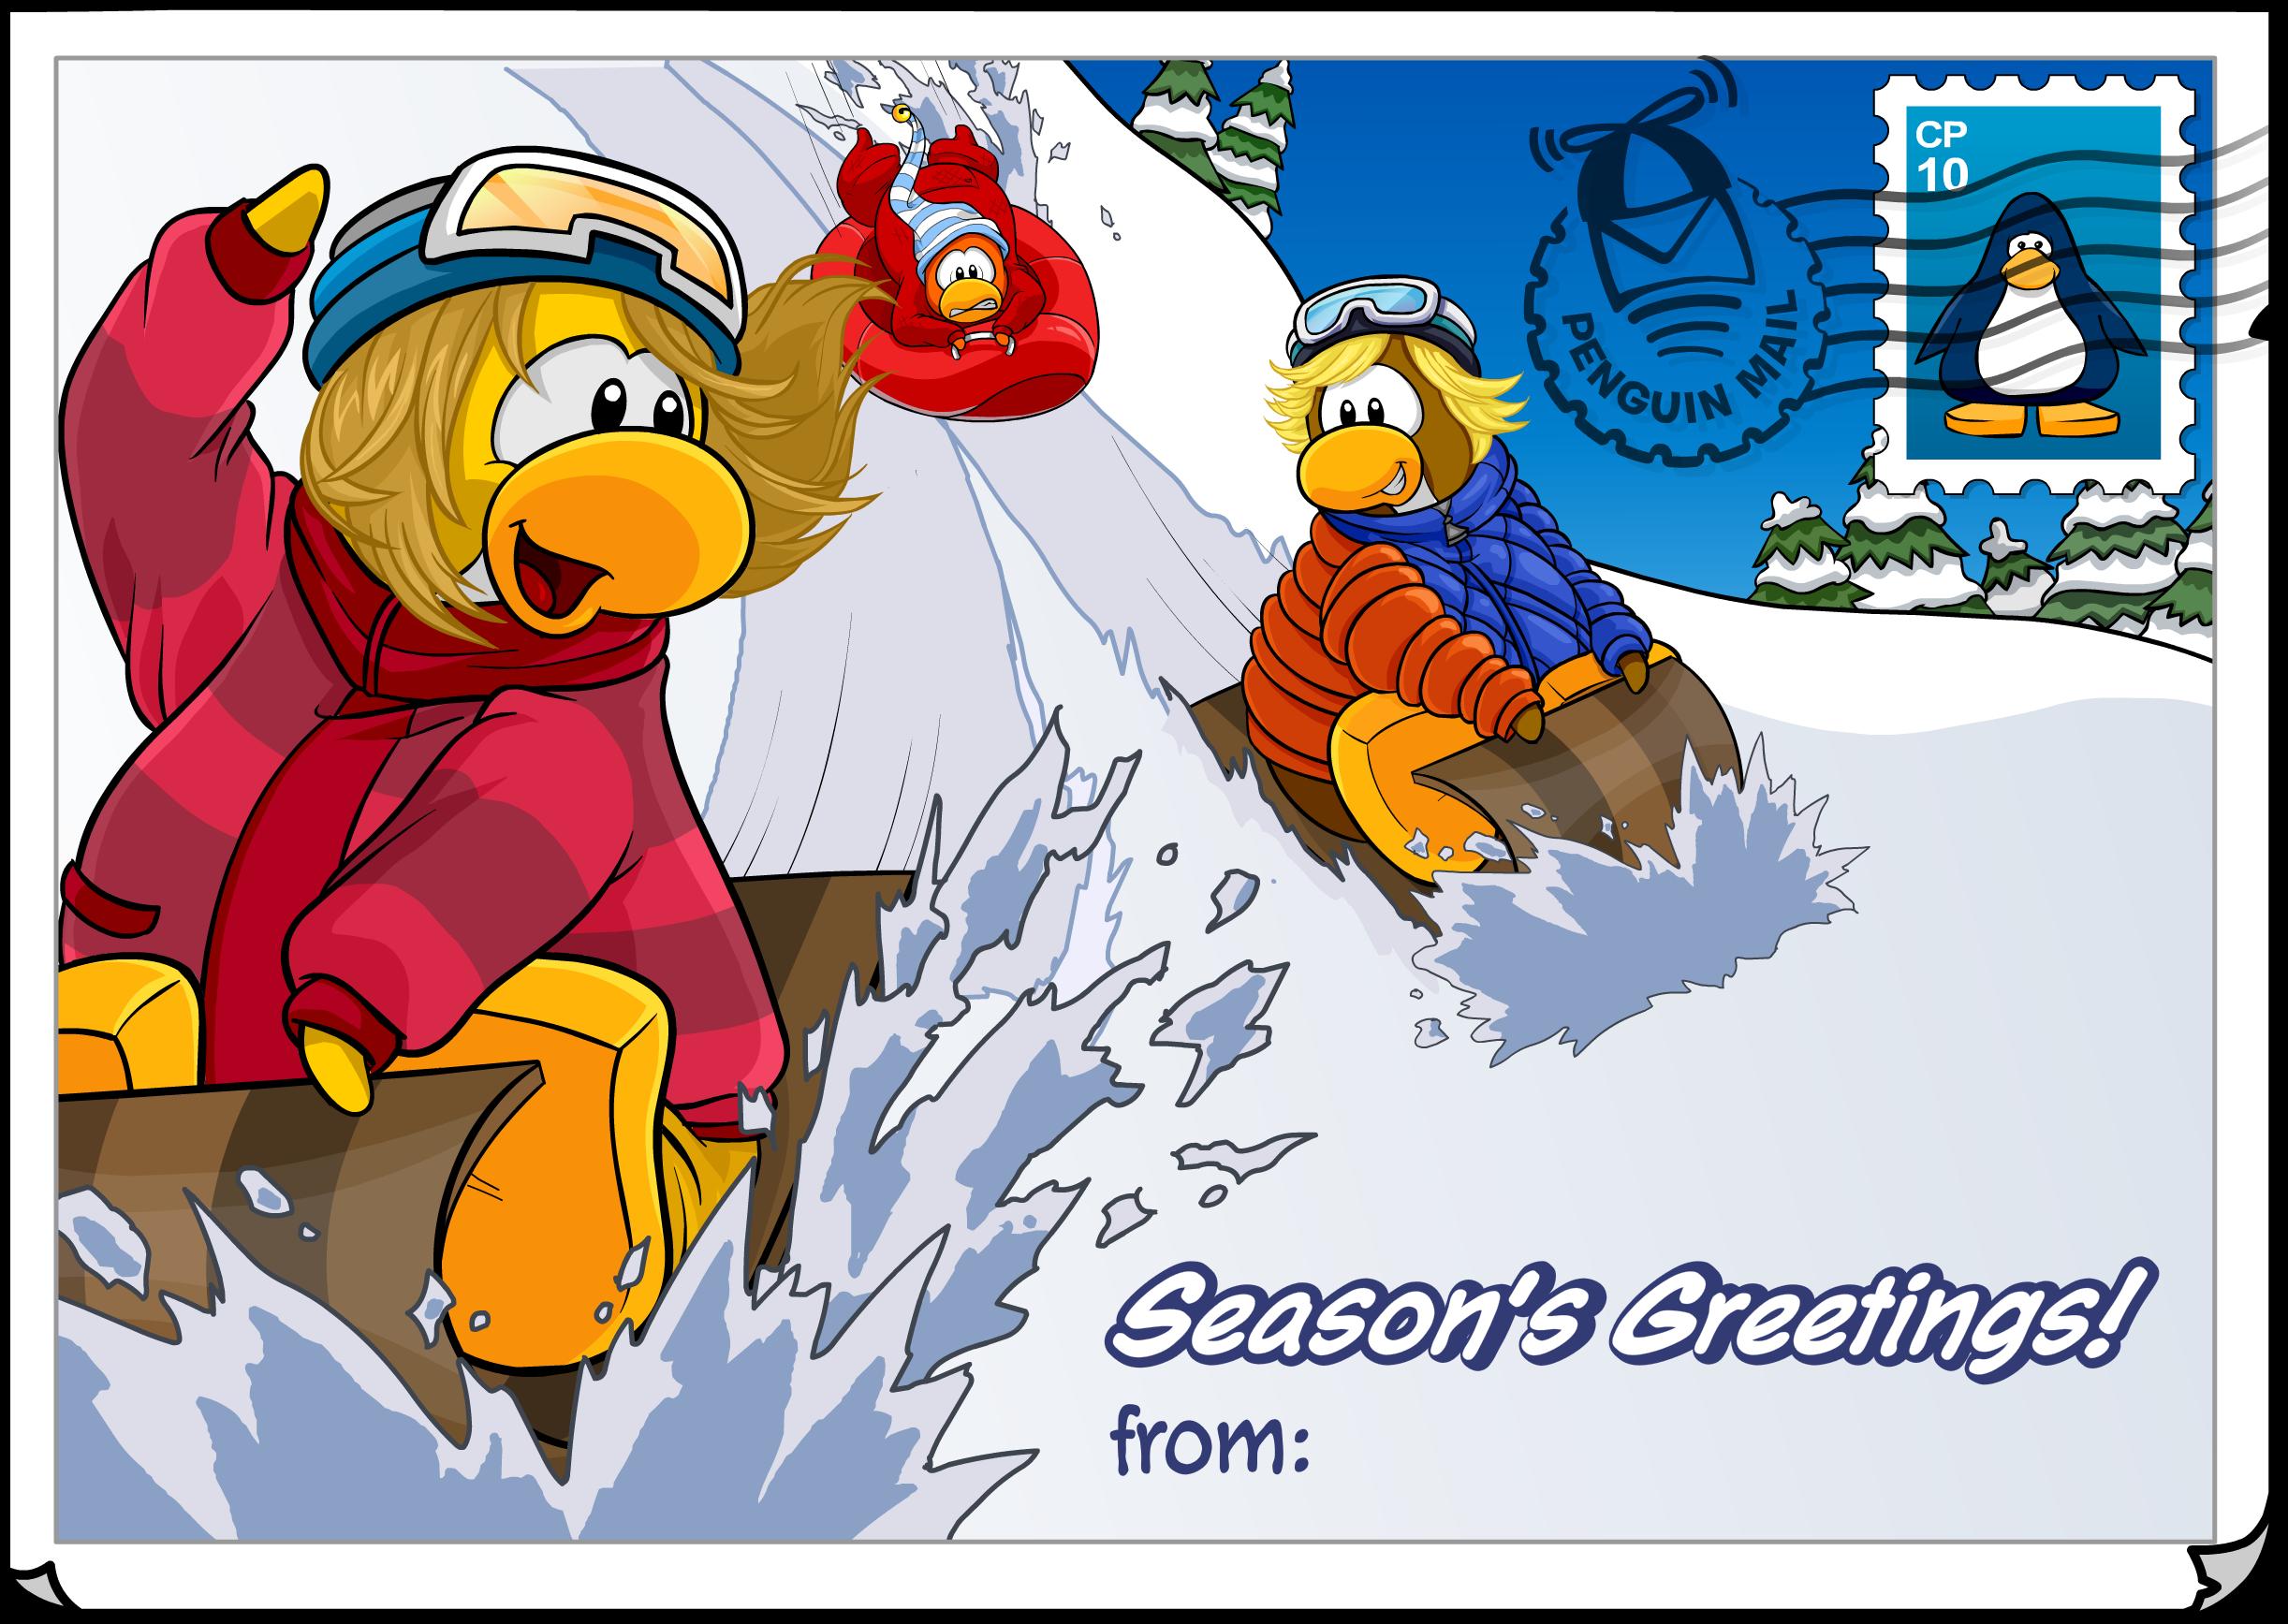 Season's Greetings Postcard (ID 210)